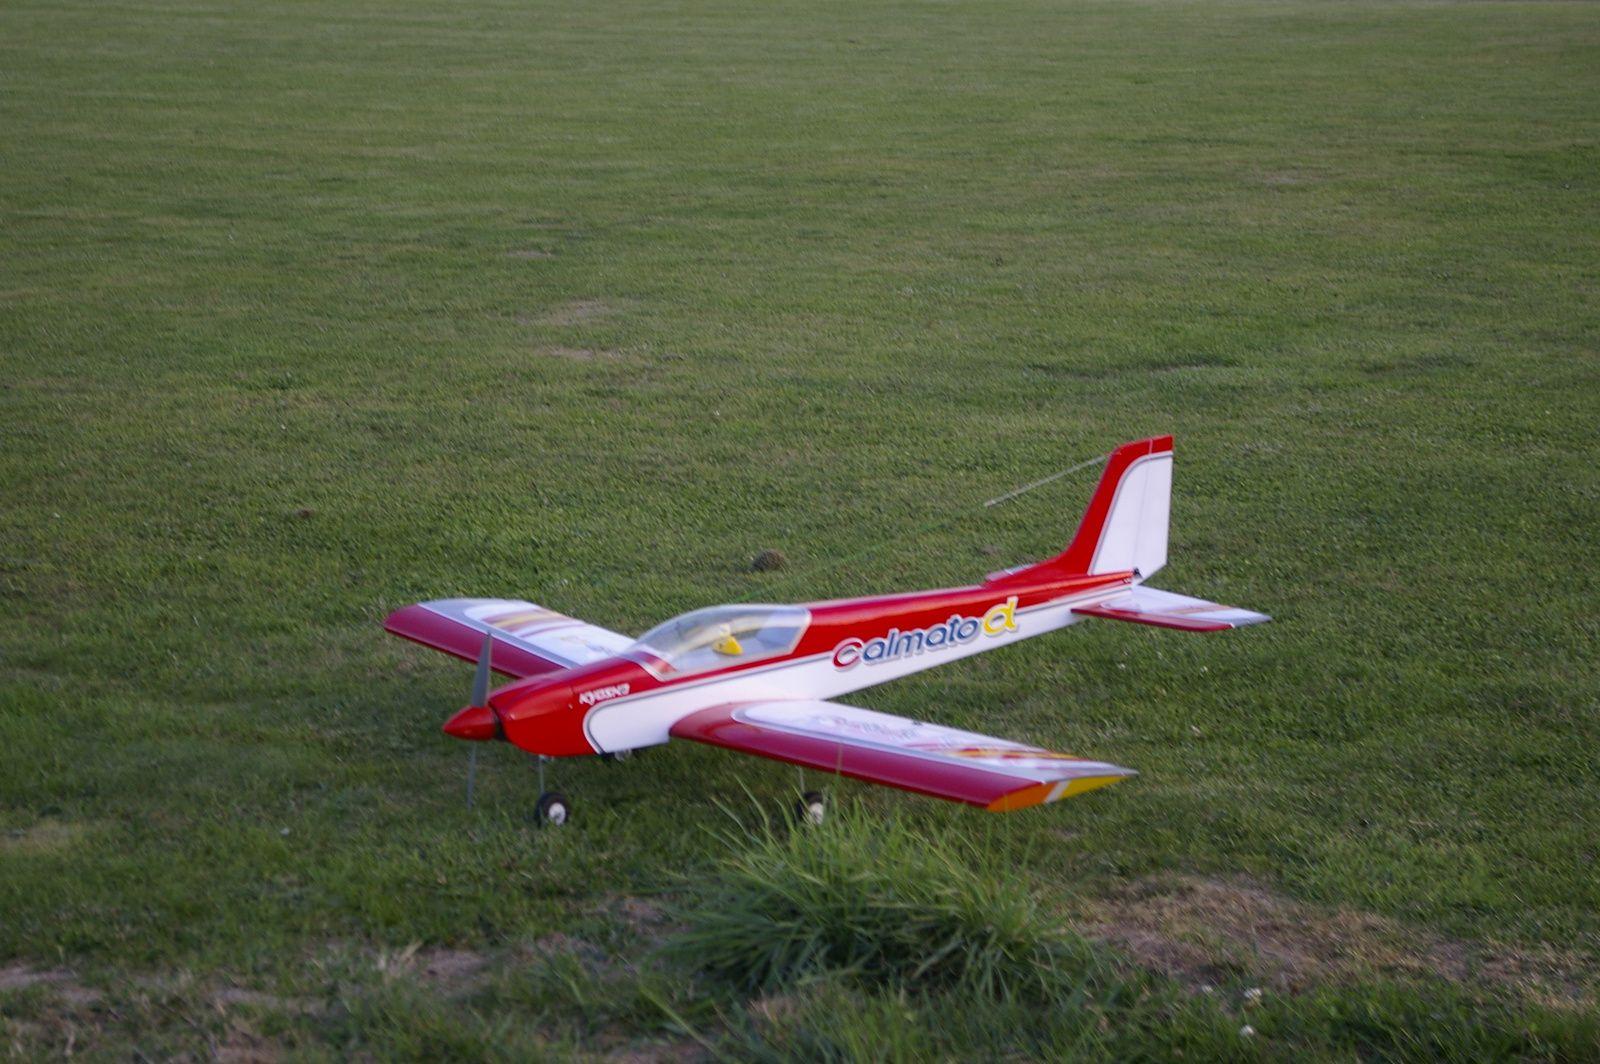 Premiers vols du Calmato 40